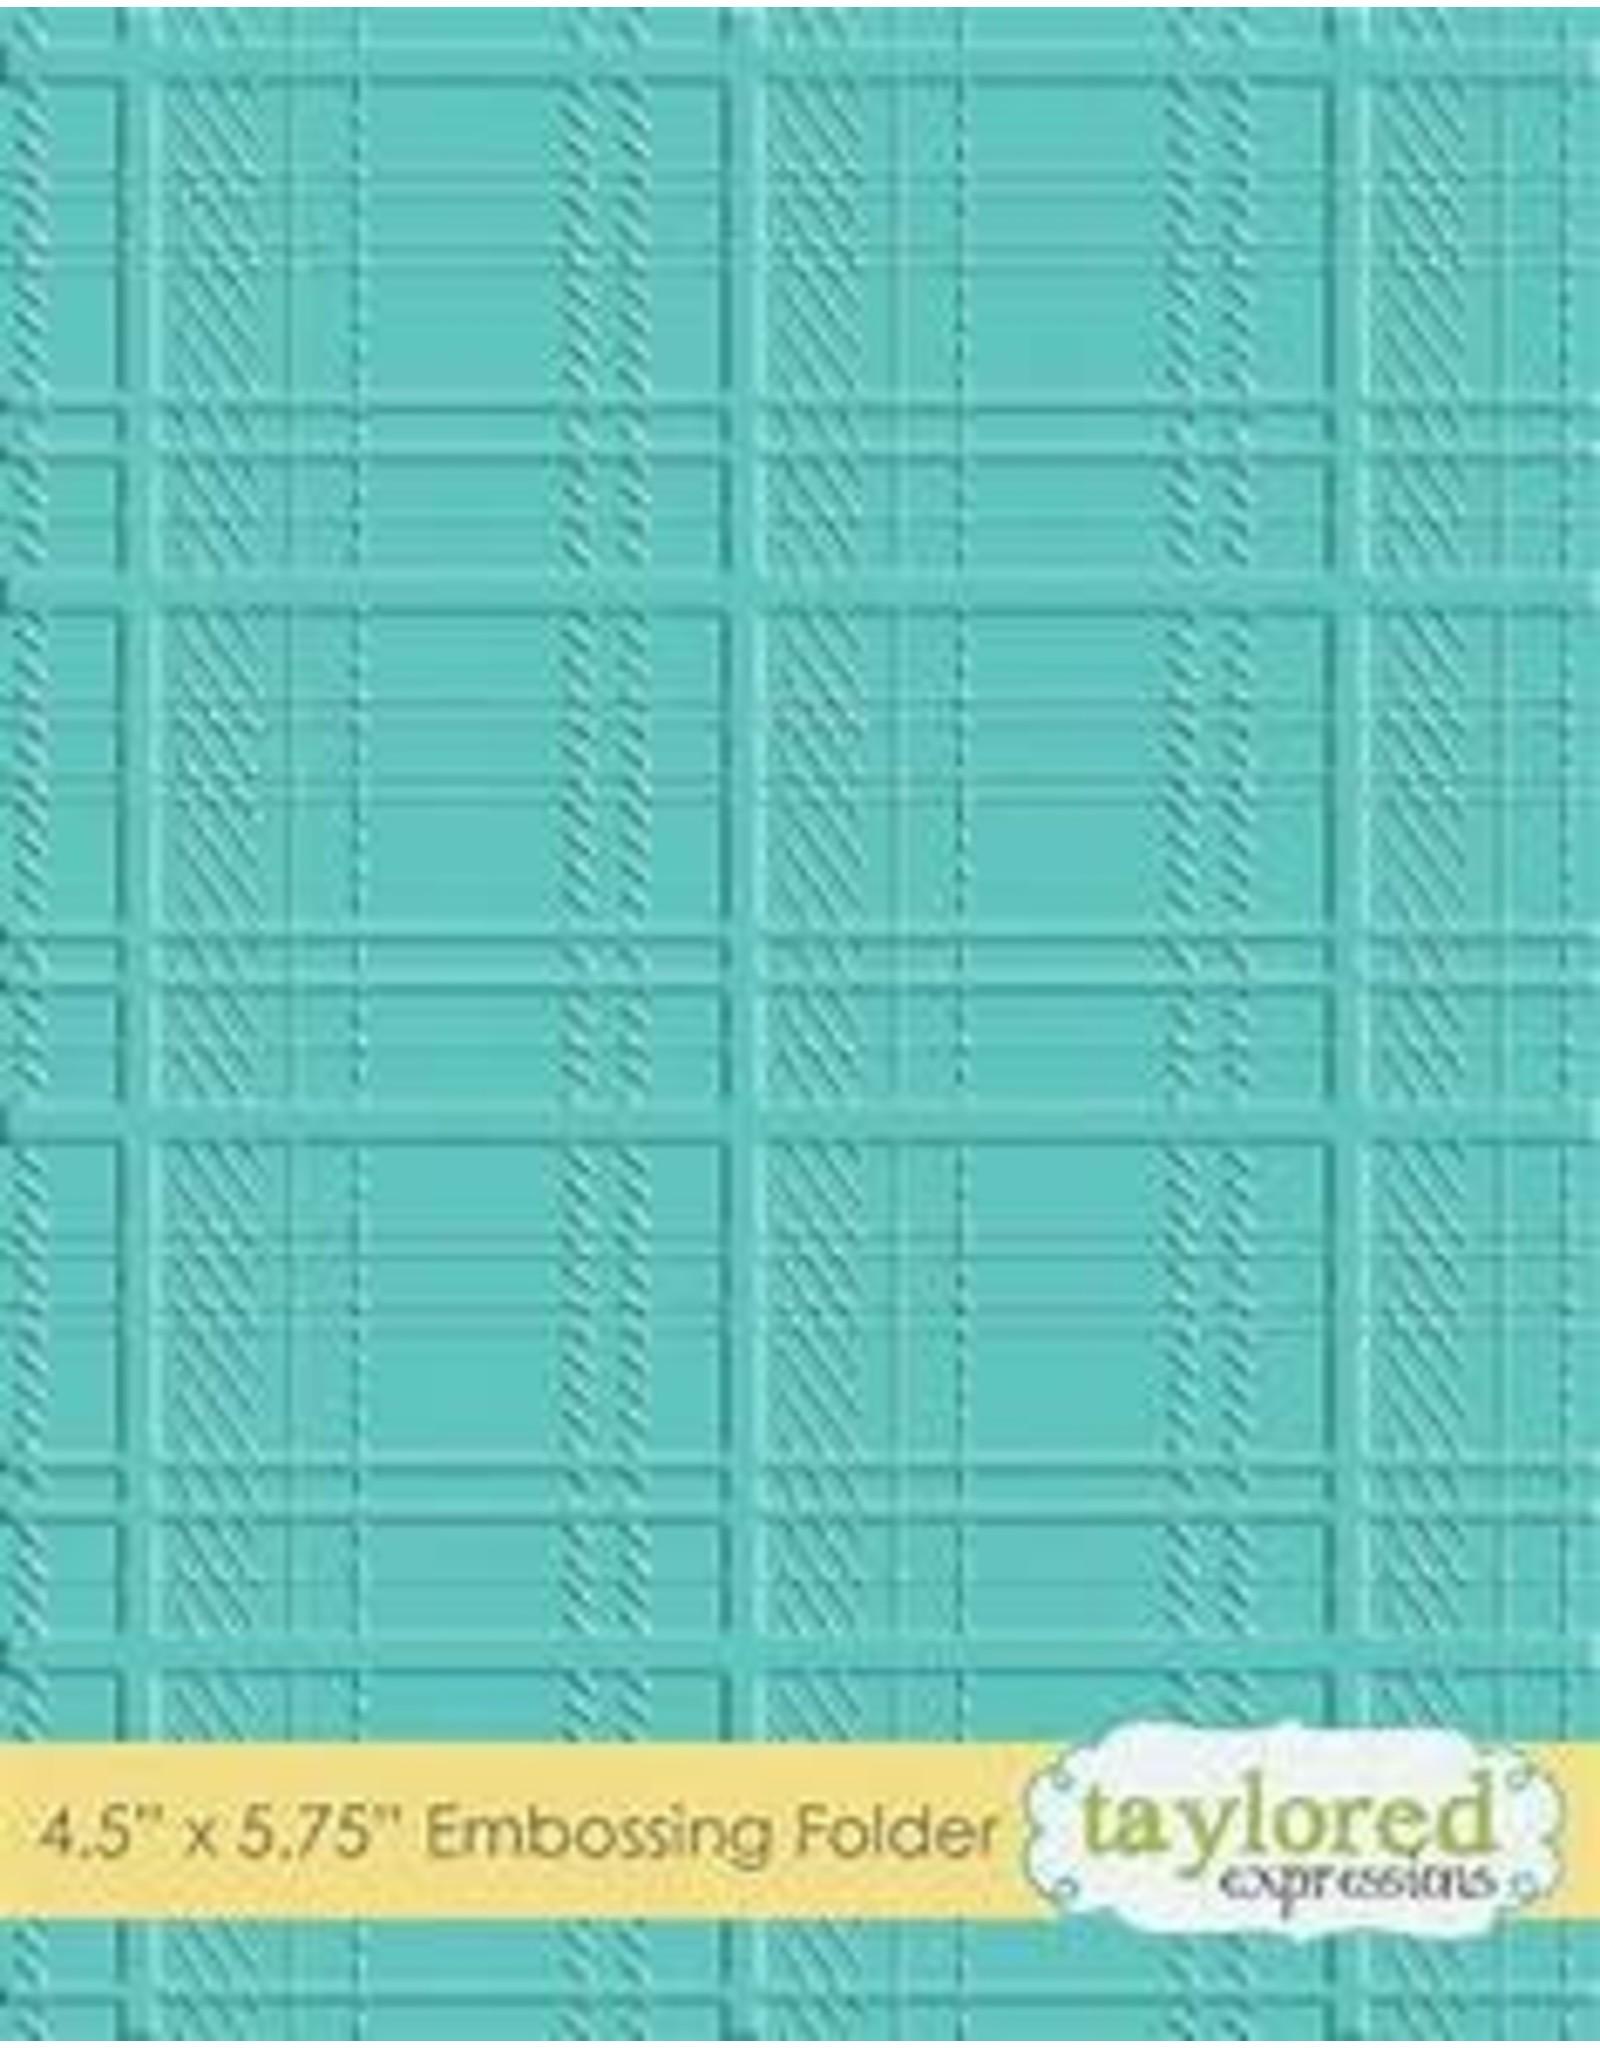 Plaid - Embossing Folder